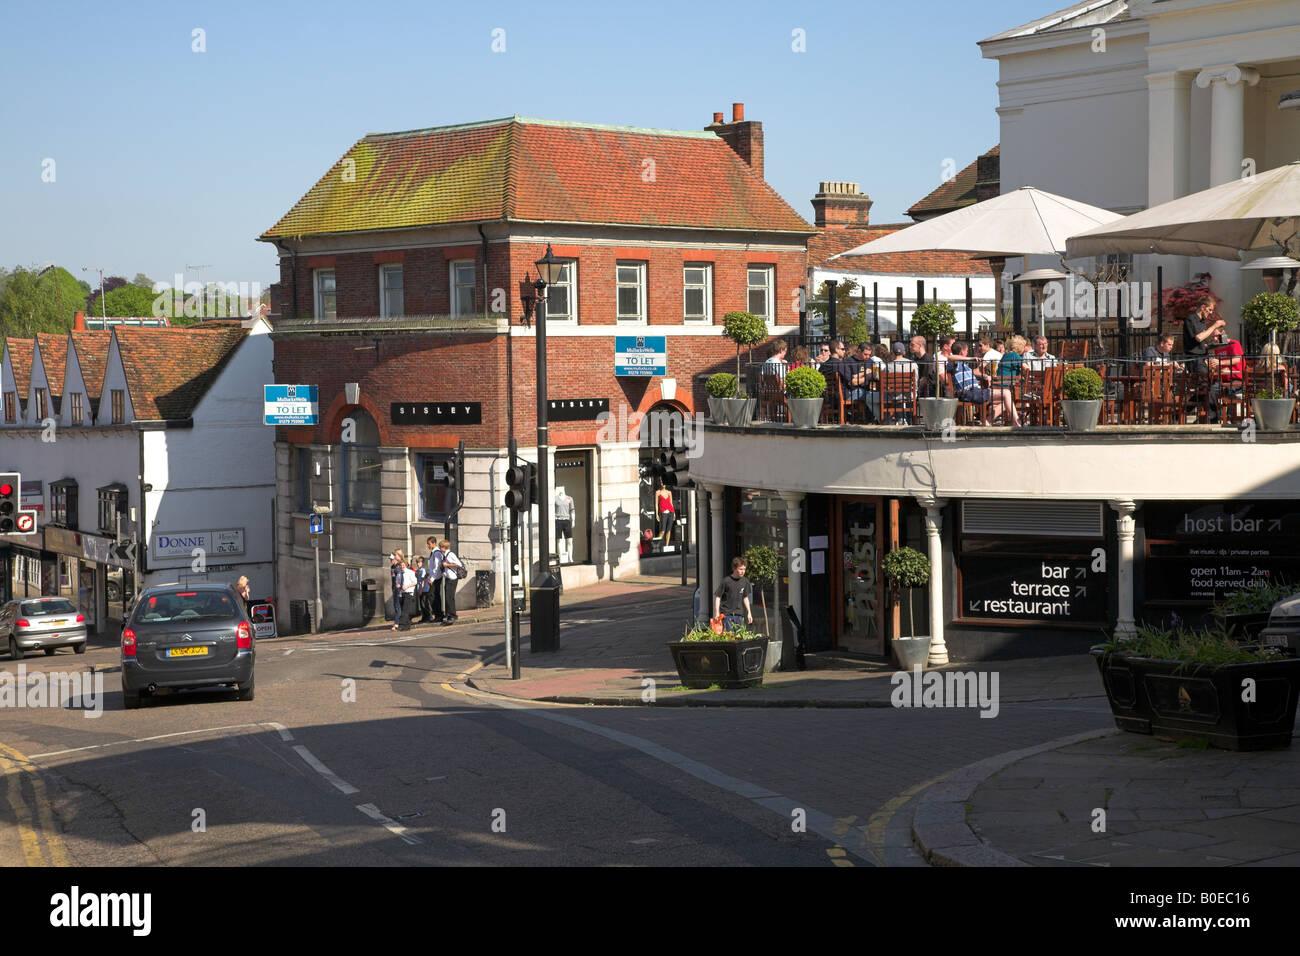 Cafe scene in the Hertfordshire market town of Bishop's Stortford. Stock Photo